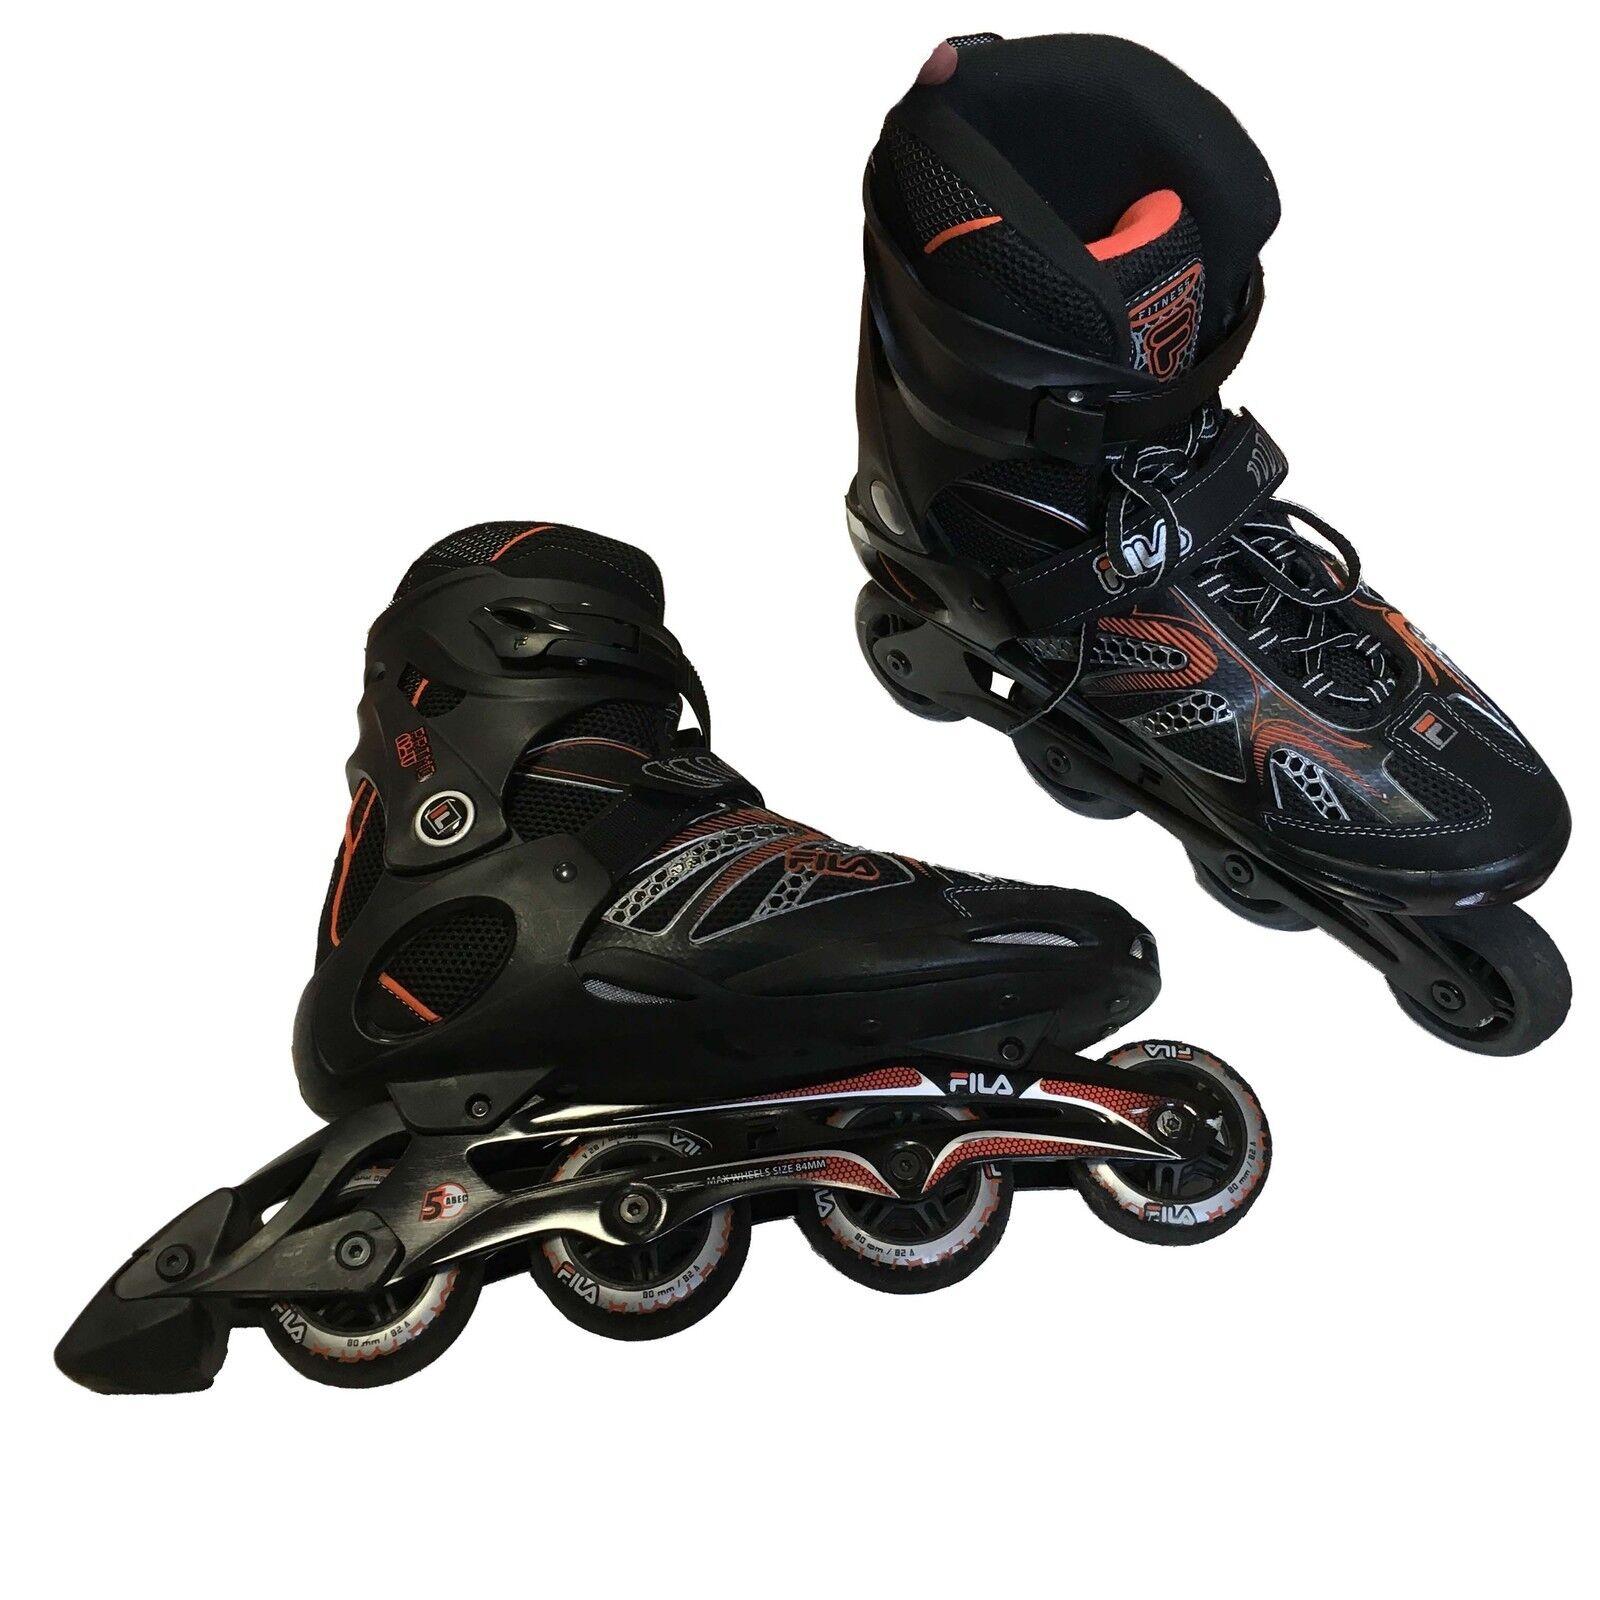 2. Wahl FILA Inline-Skates